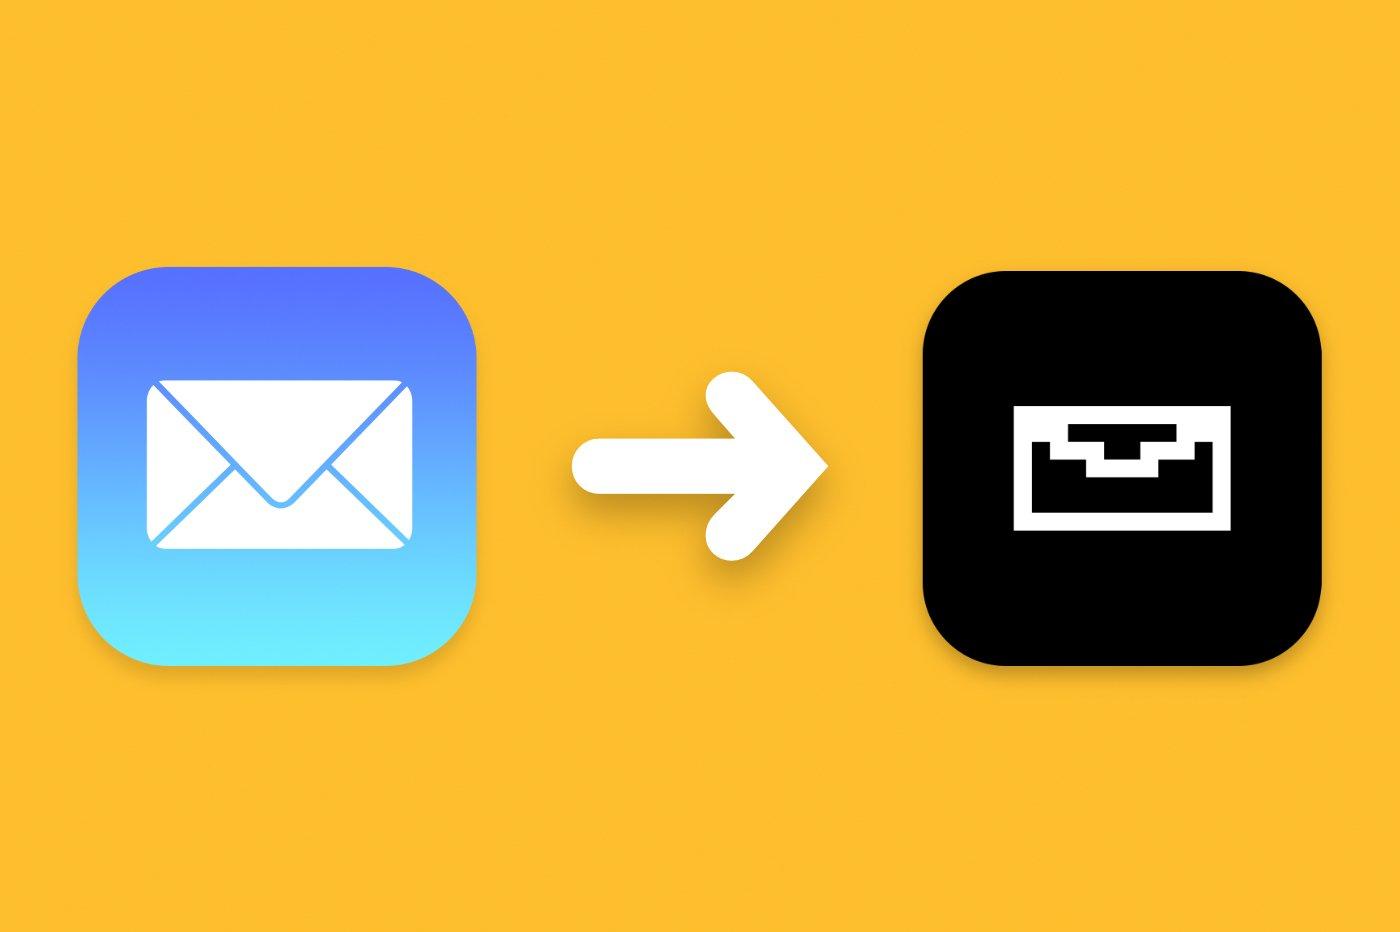 Tutoriel iPhone et iPad, changer icône app iOS